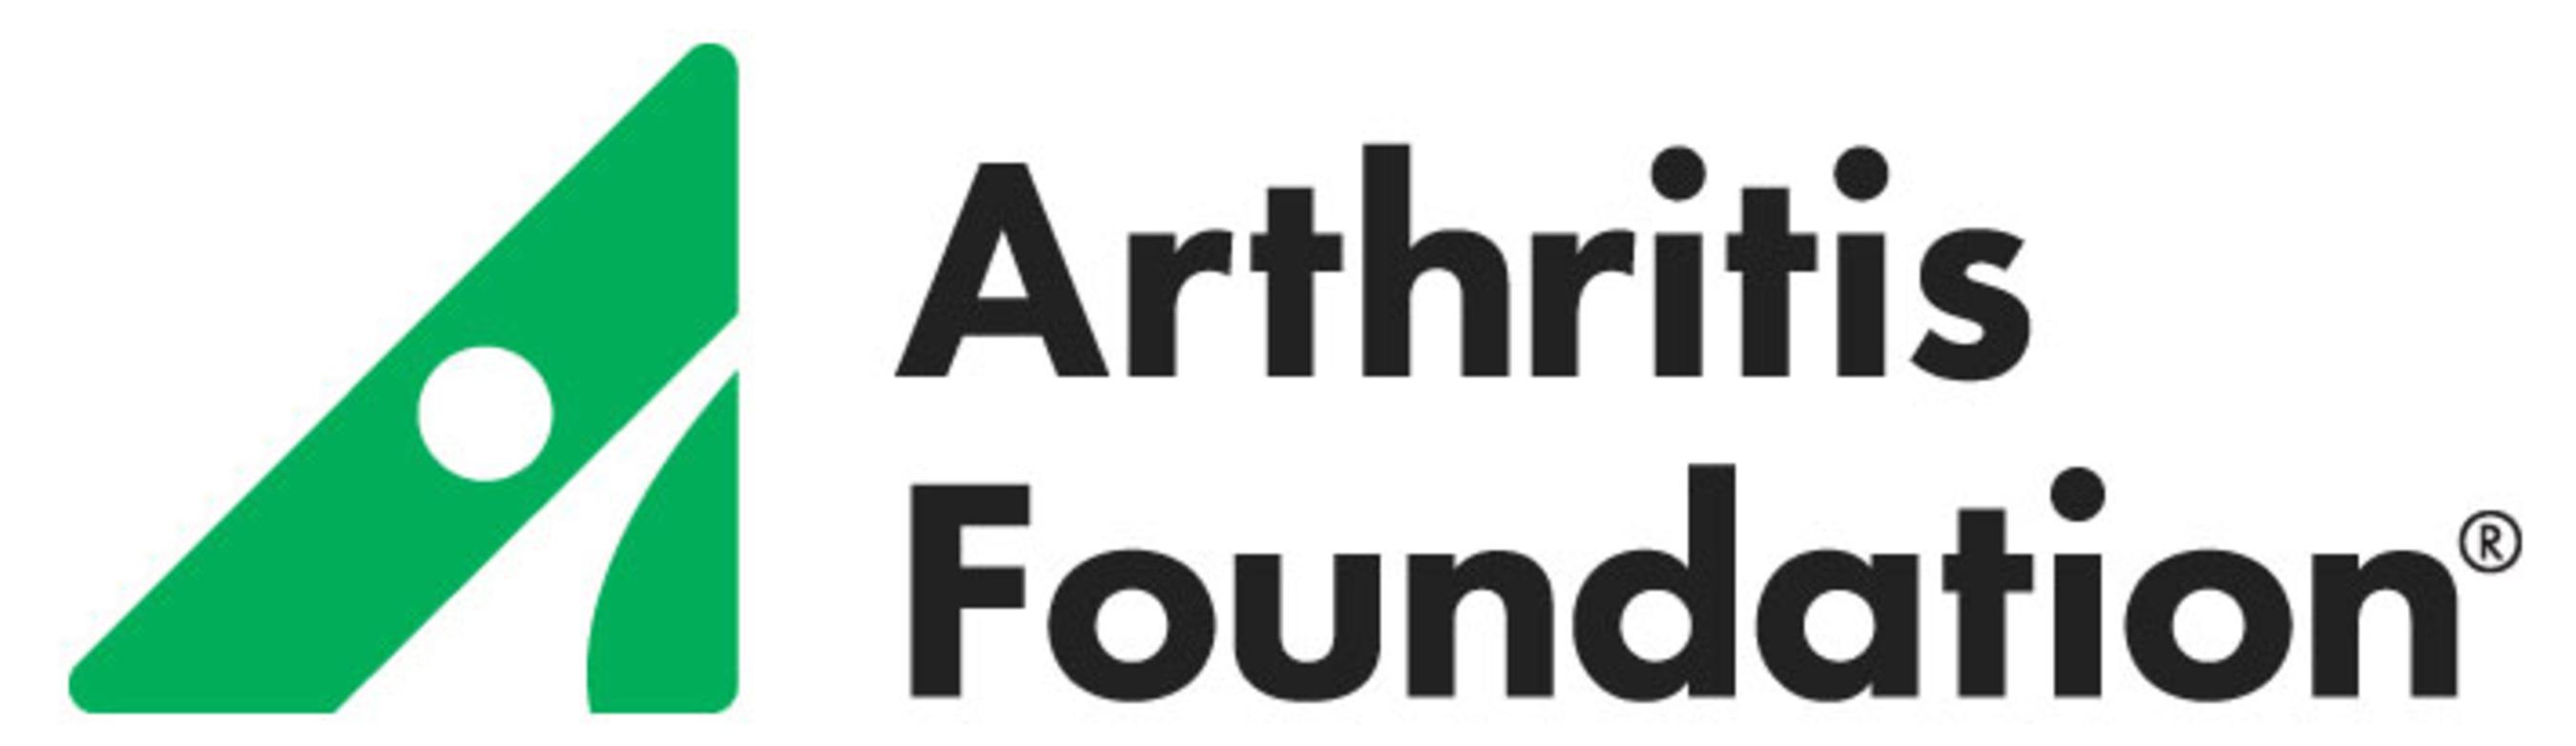 ArthritisFoundation